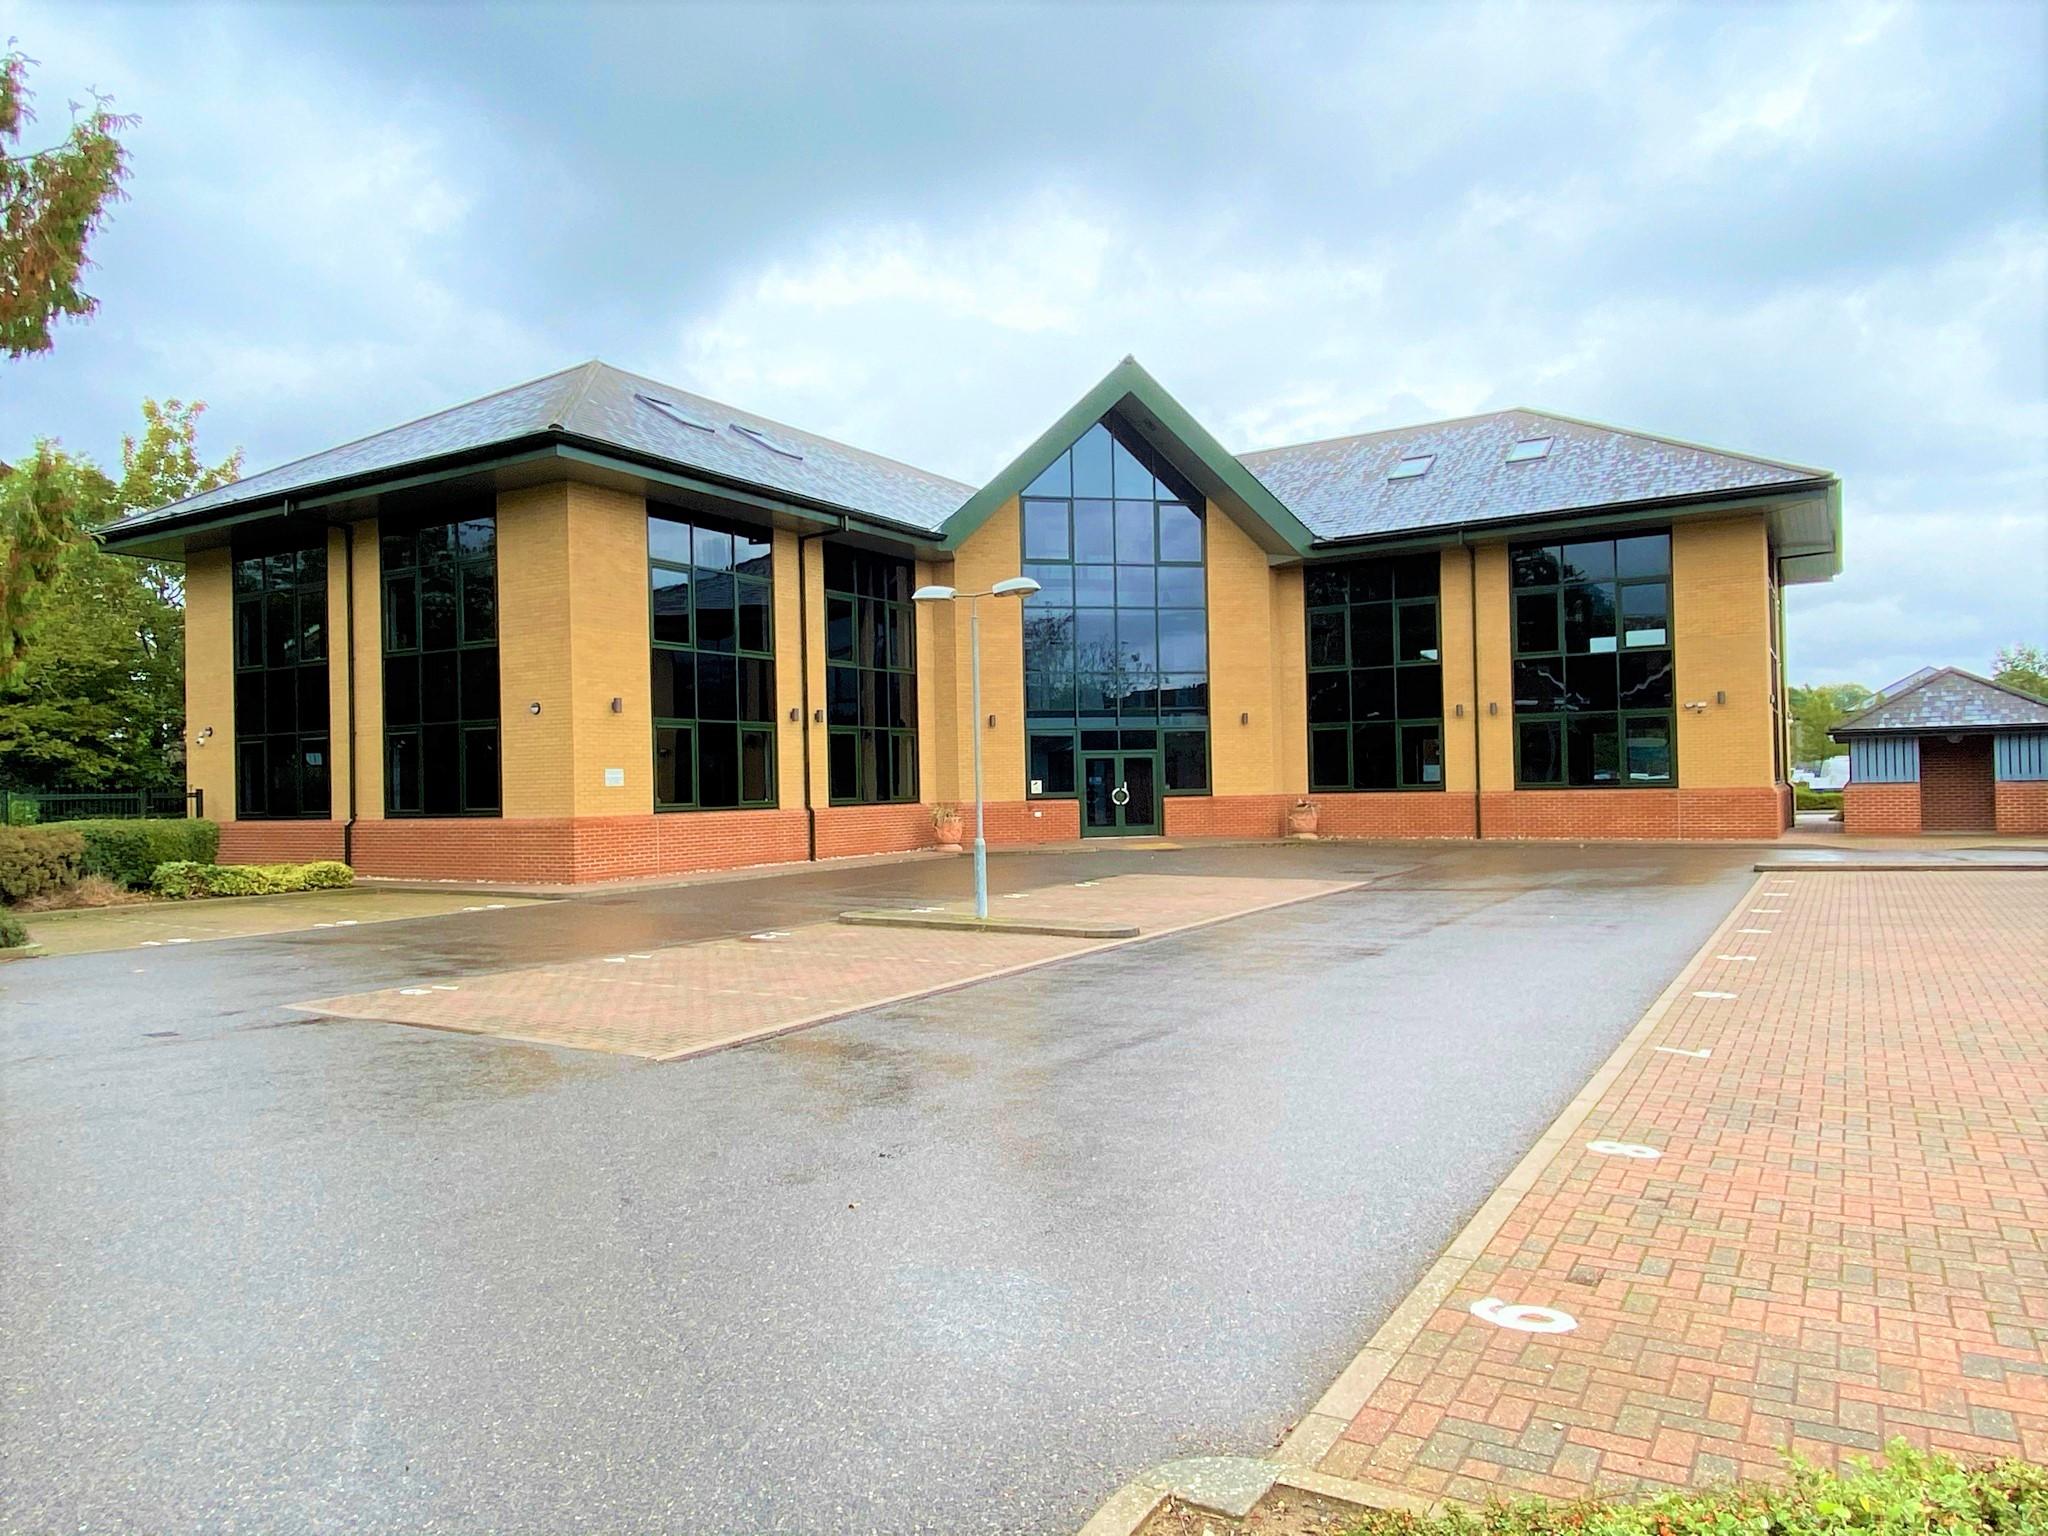 Image of Gemini House, Mill Green Road Industrial Estate, Mill Green Road, Haywards Heath, West Sussex, RH16 1XQ